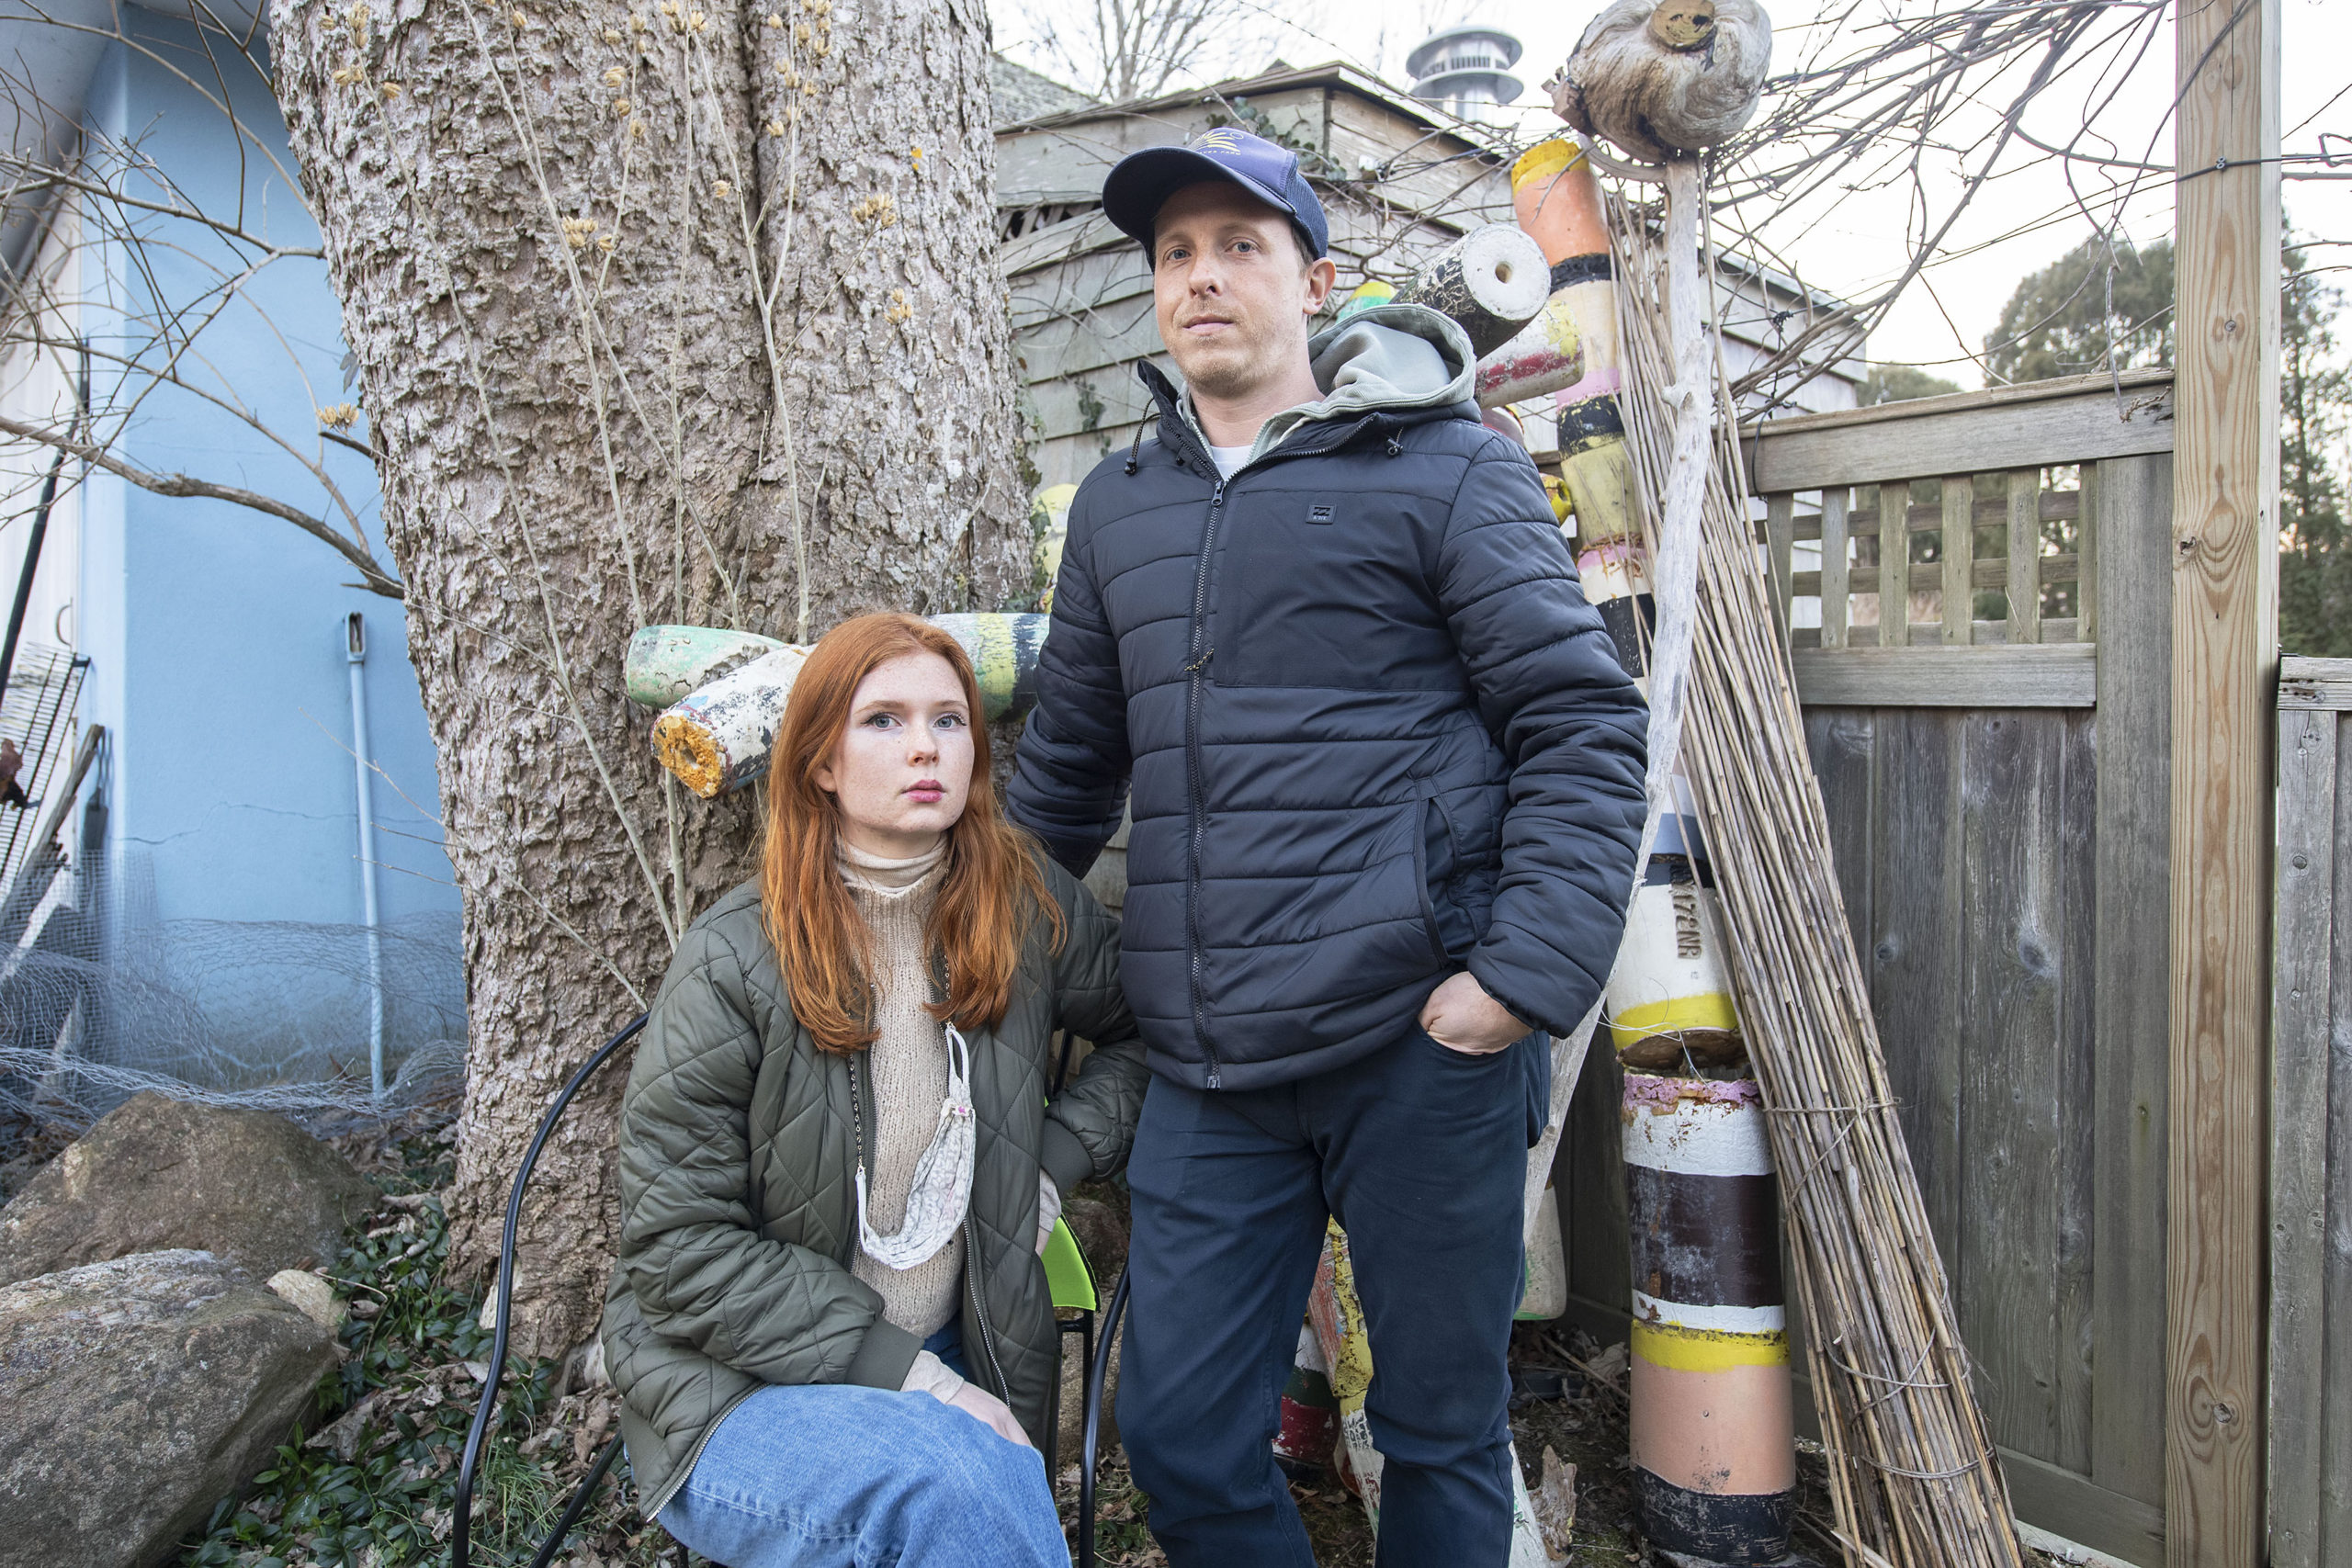 Scott Bluedorn and his fiancée, Rowan Hausman, at their winter rental in East Hampton.